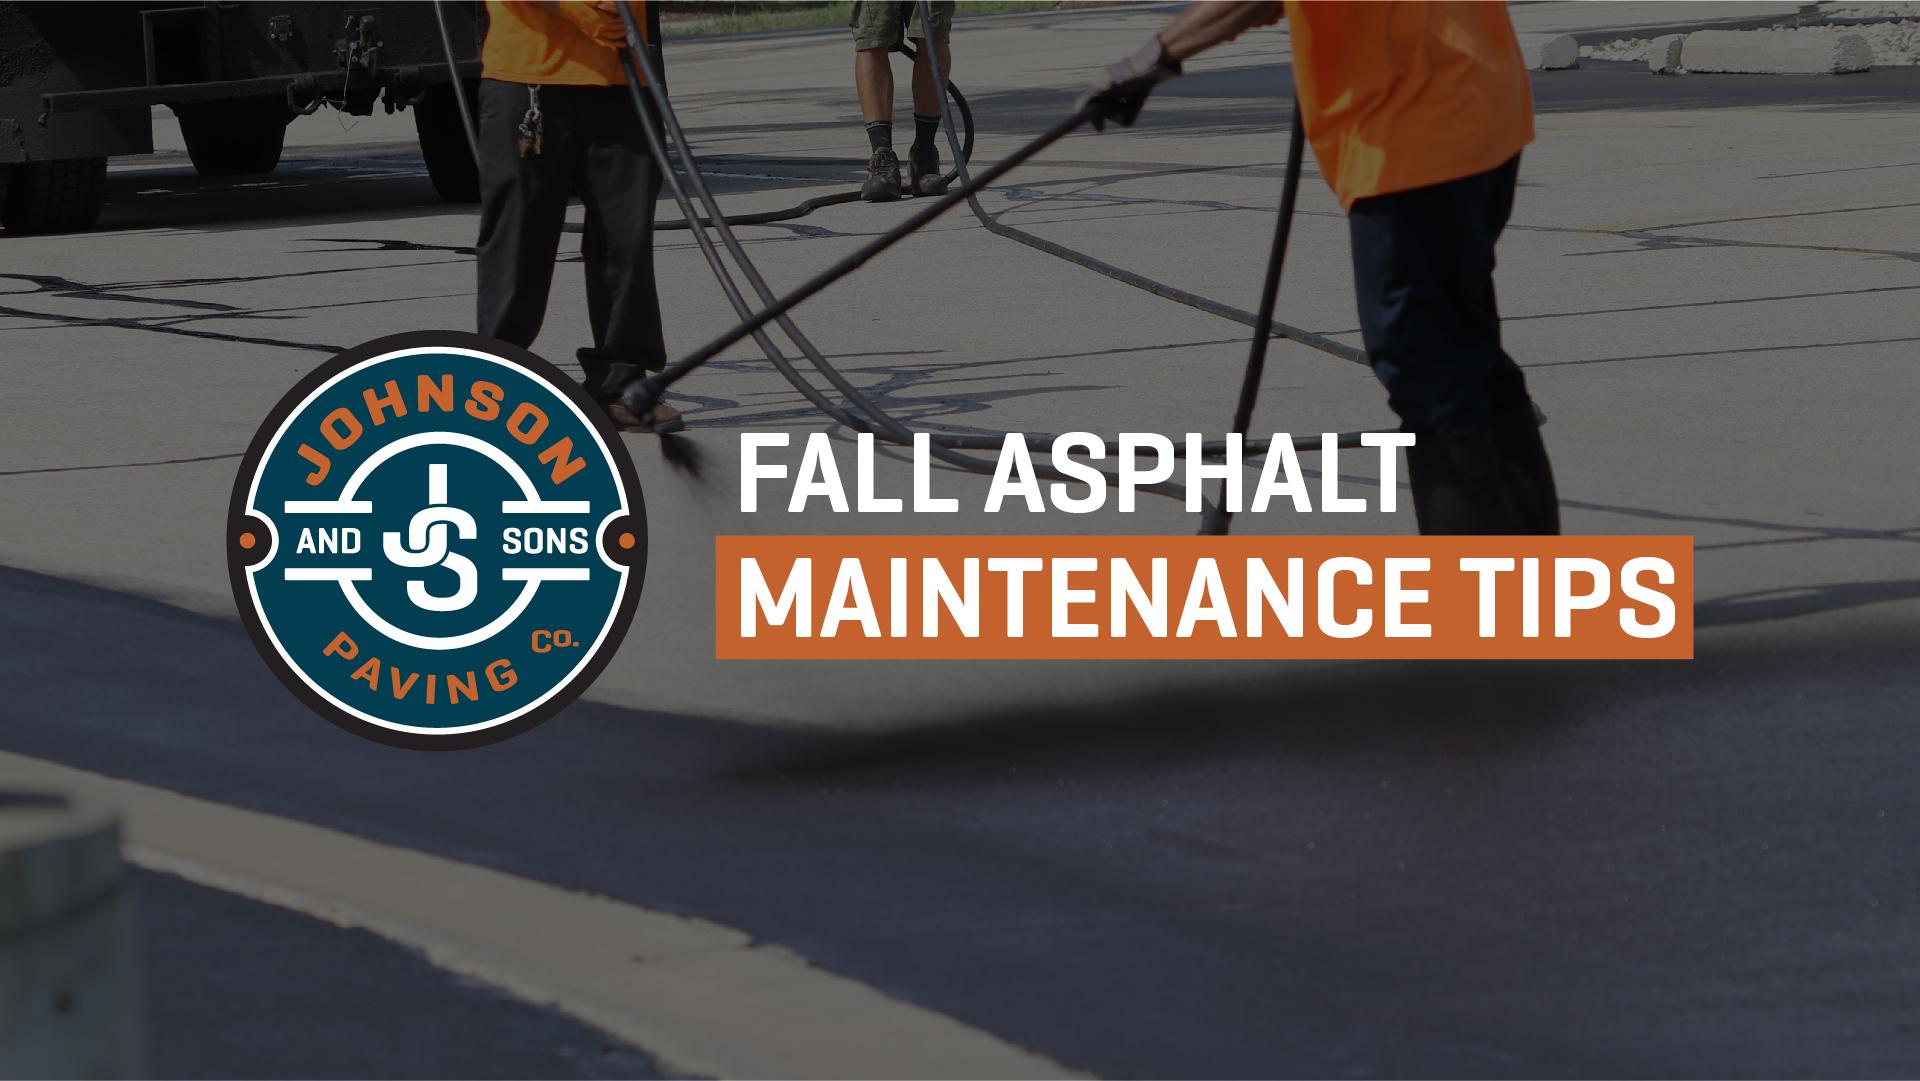 Fall Asphalt Maintenance Tips